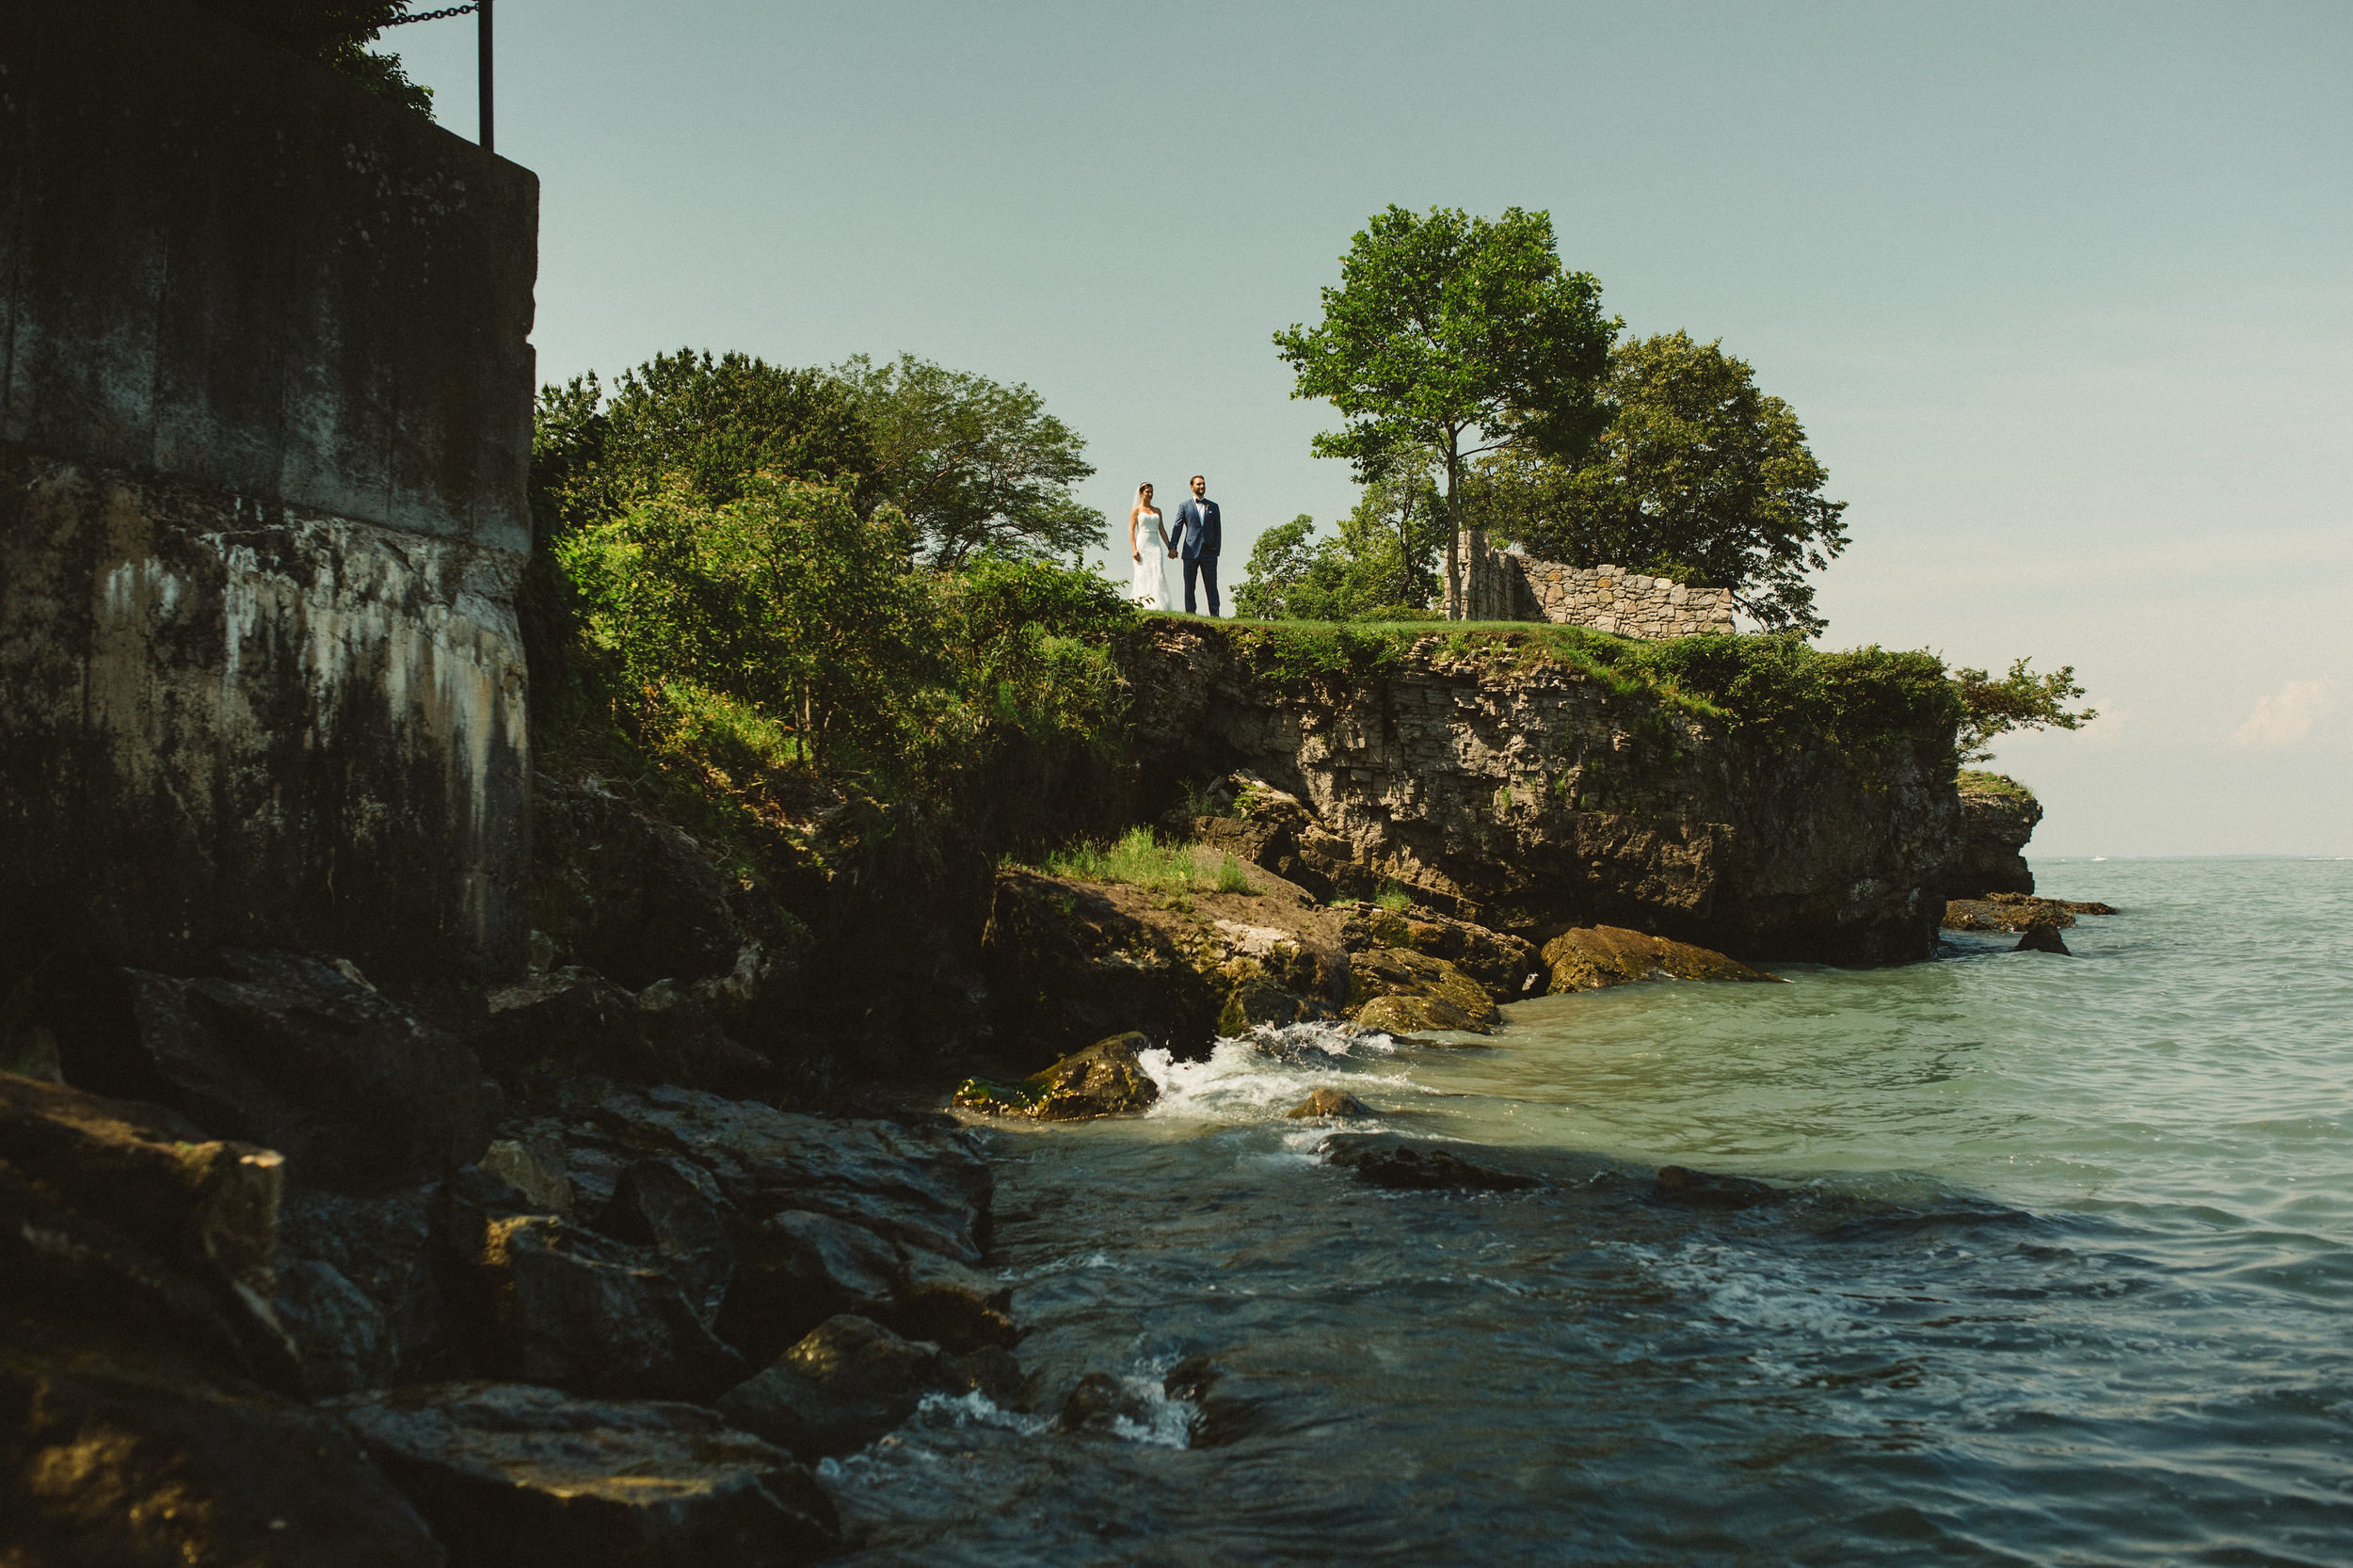 Bride and groom wedding photography by lake erie in Catawba Island, Ohio.